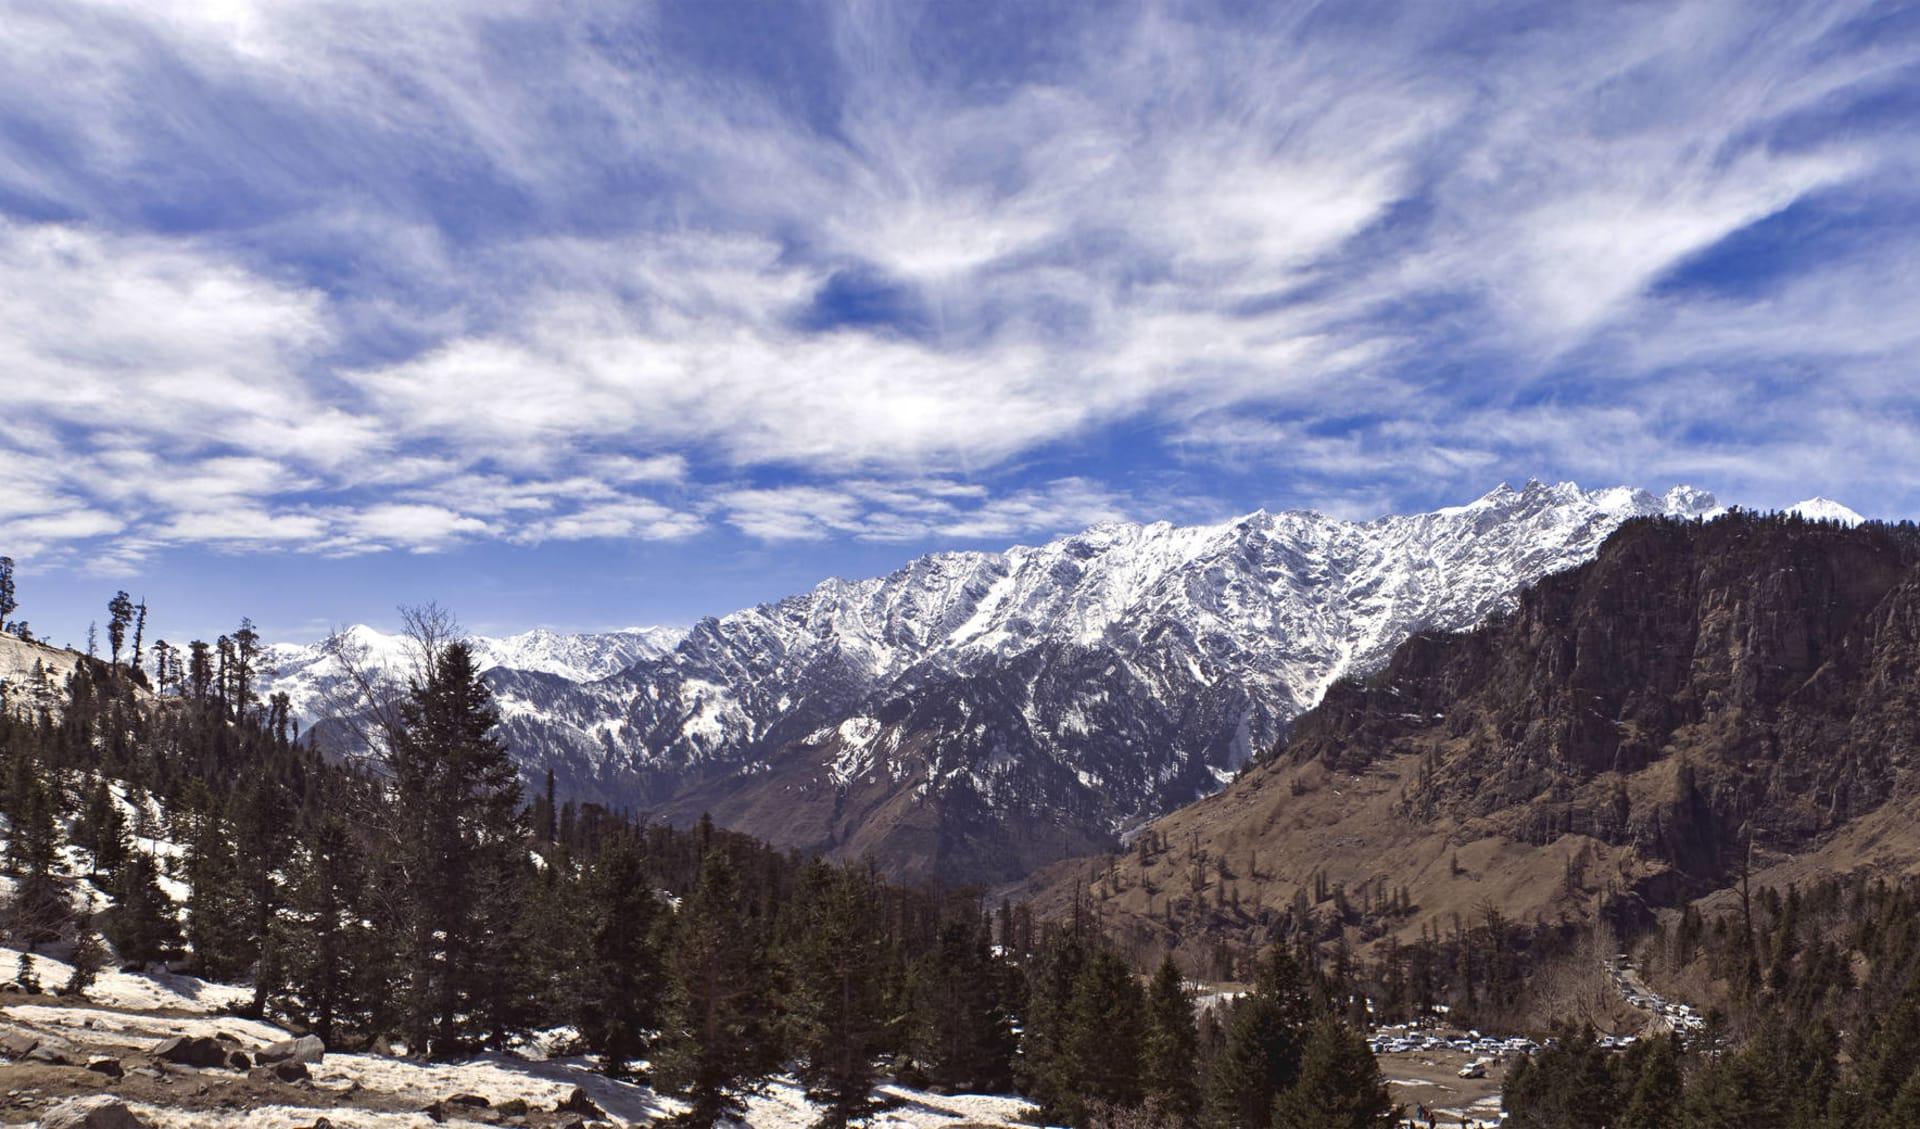 Am Fusse des Himalaya ab Delhi: Himalaya: Manali